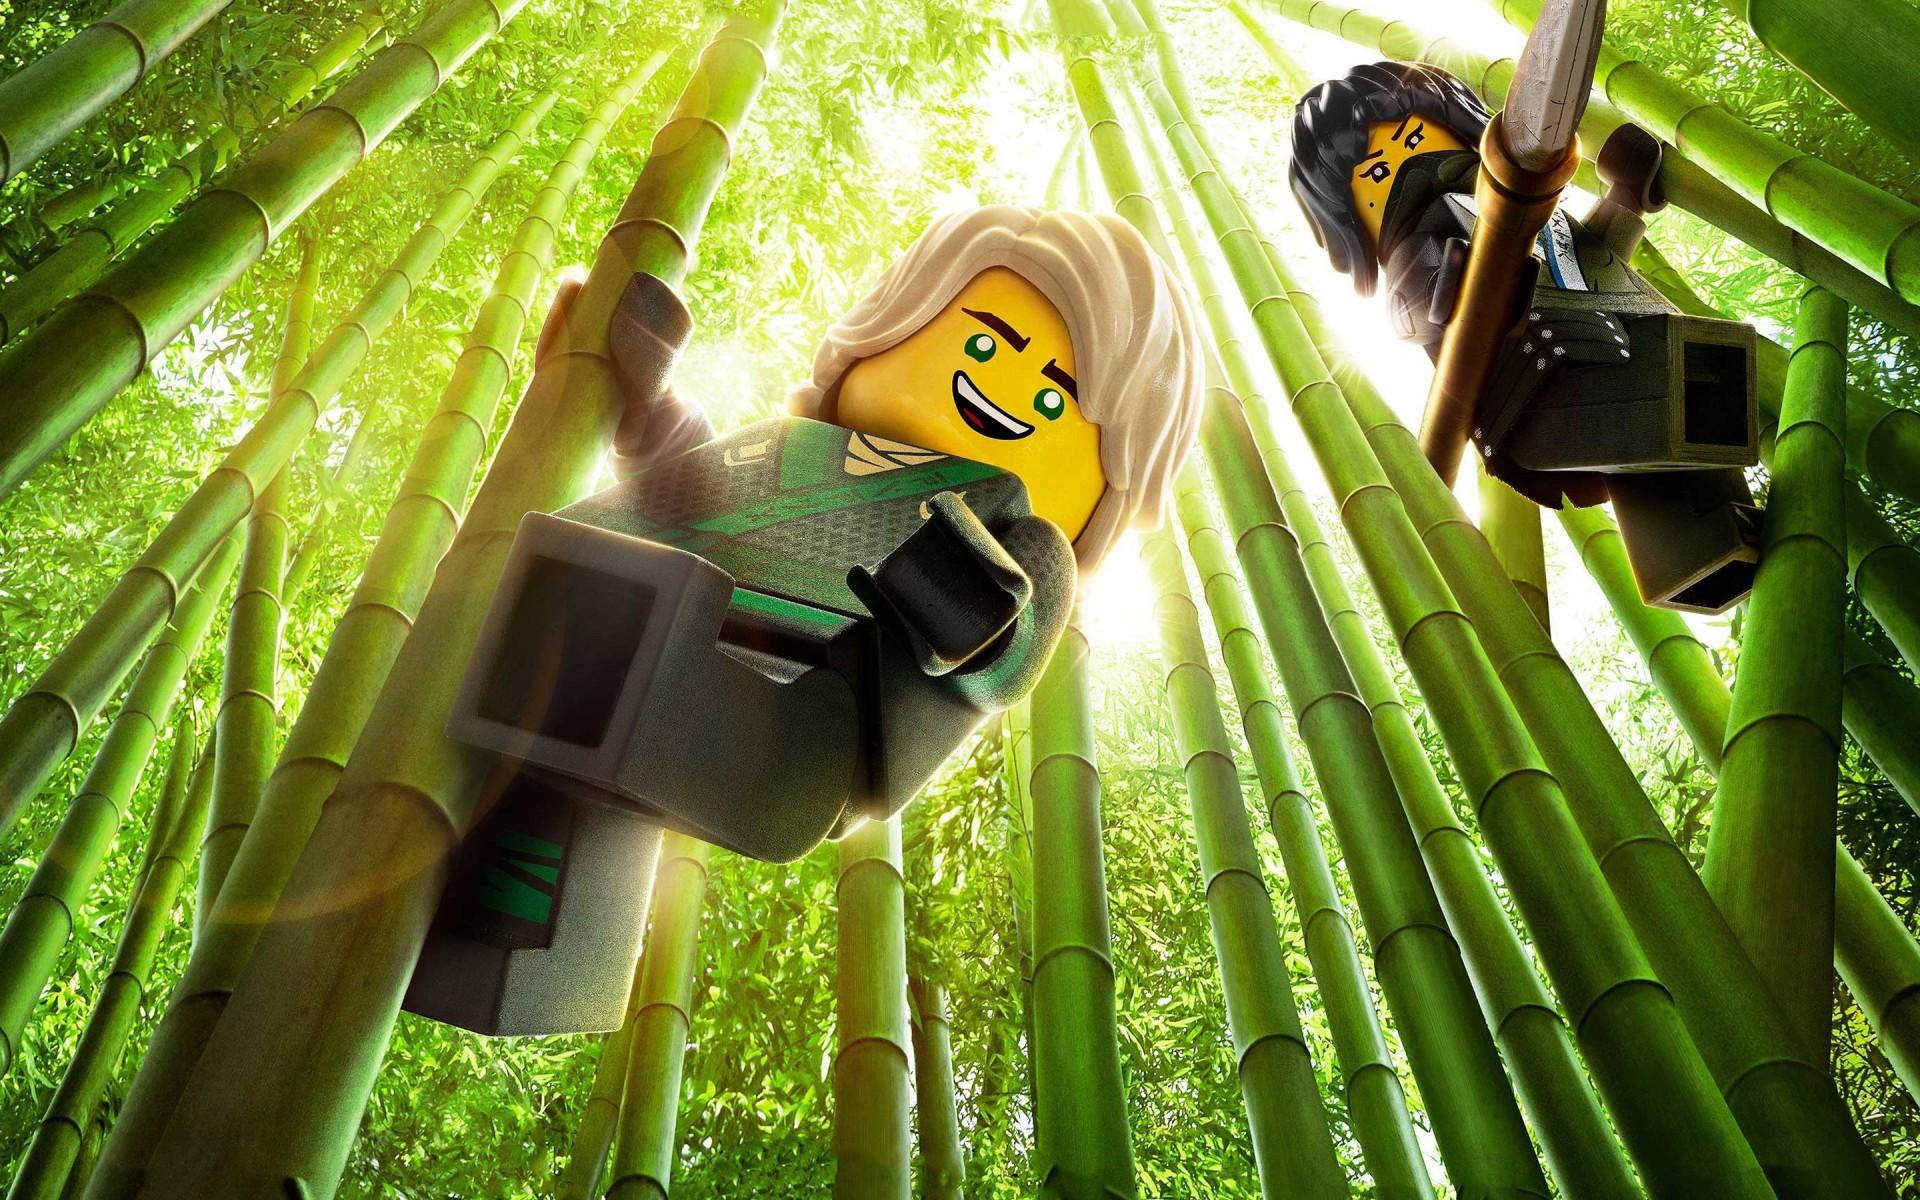 Harley Quinn Hd Iphone Wallpaper Nya Lloyd The Lego Ninjago Movie 2017 Wallpapers Hd